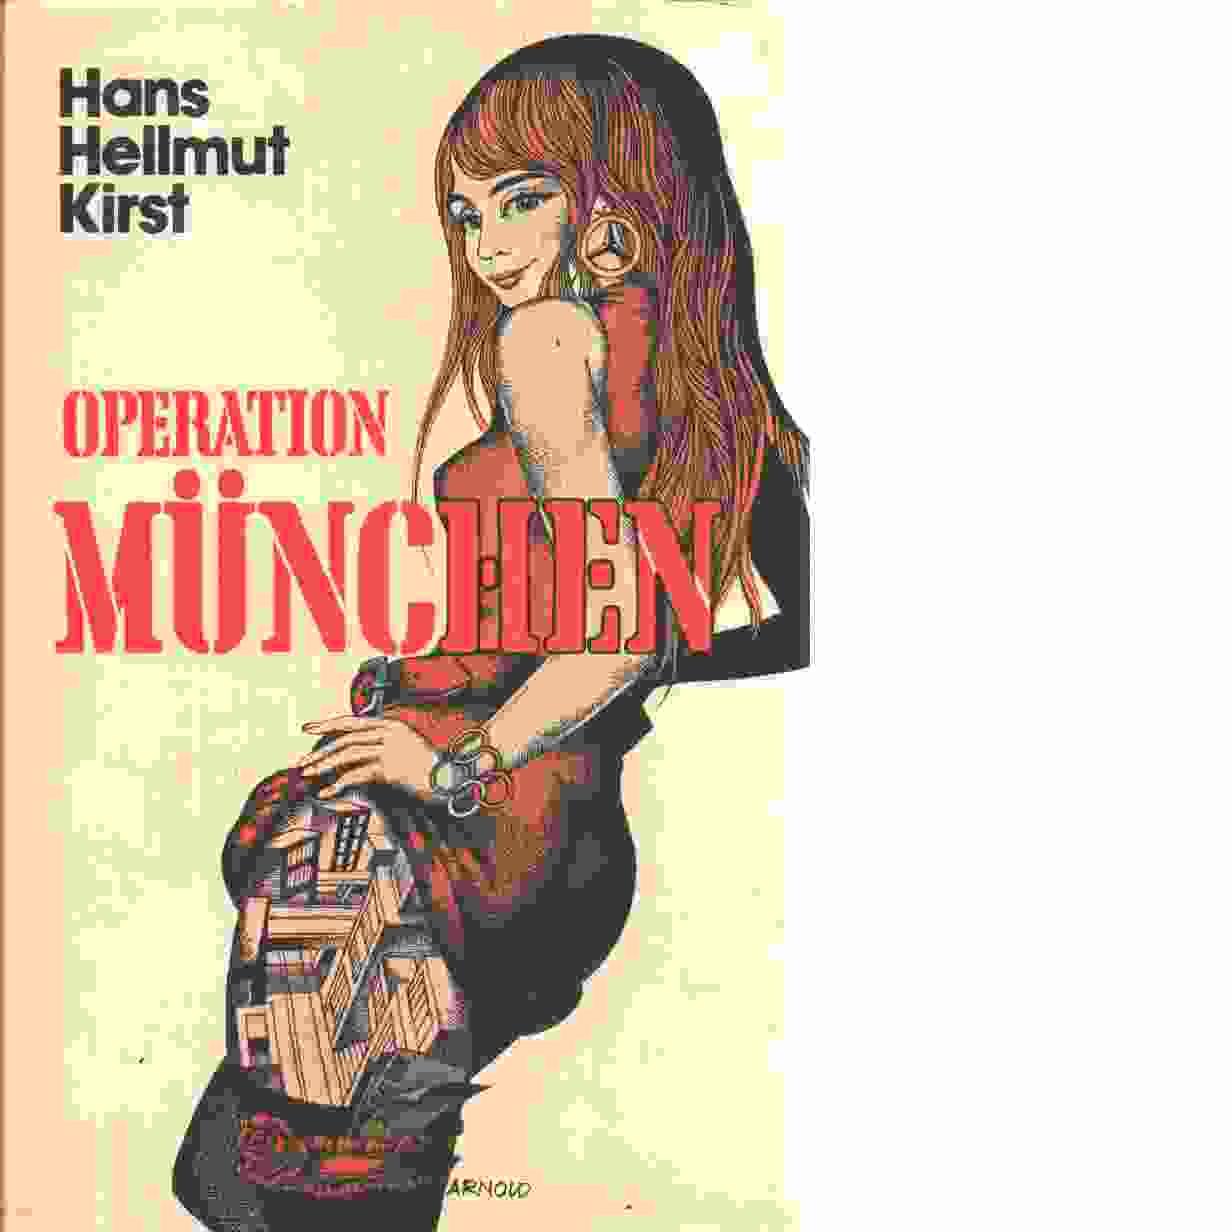 Operation München - Kirst, Hans Hellmut